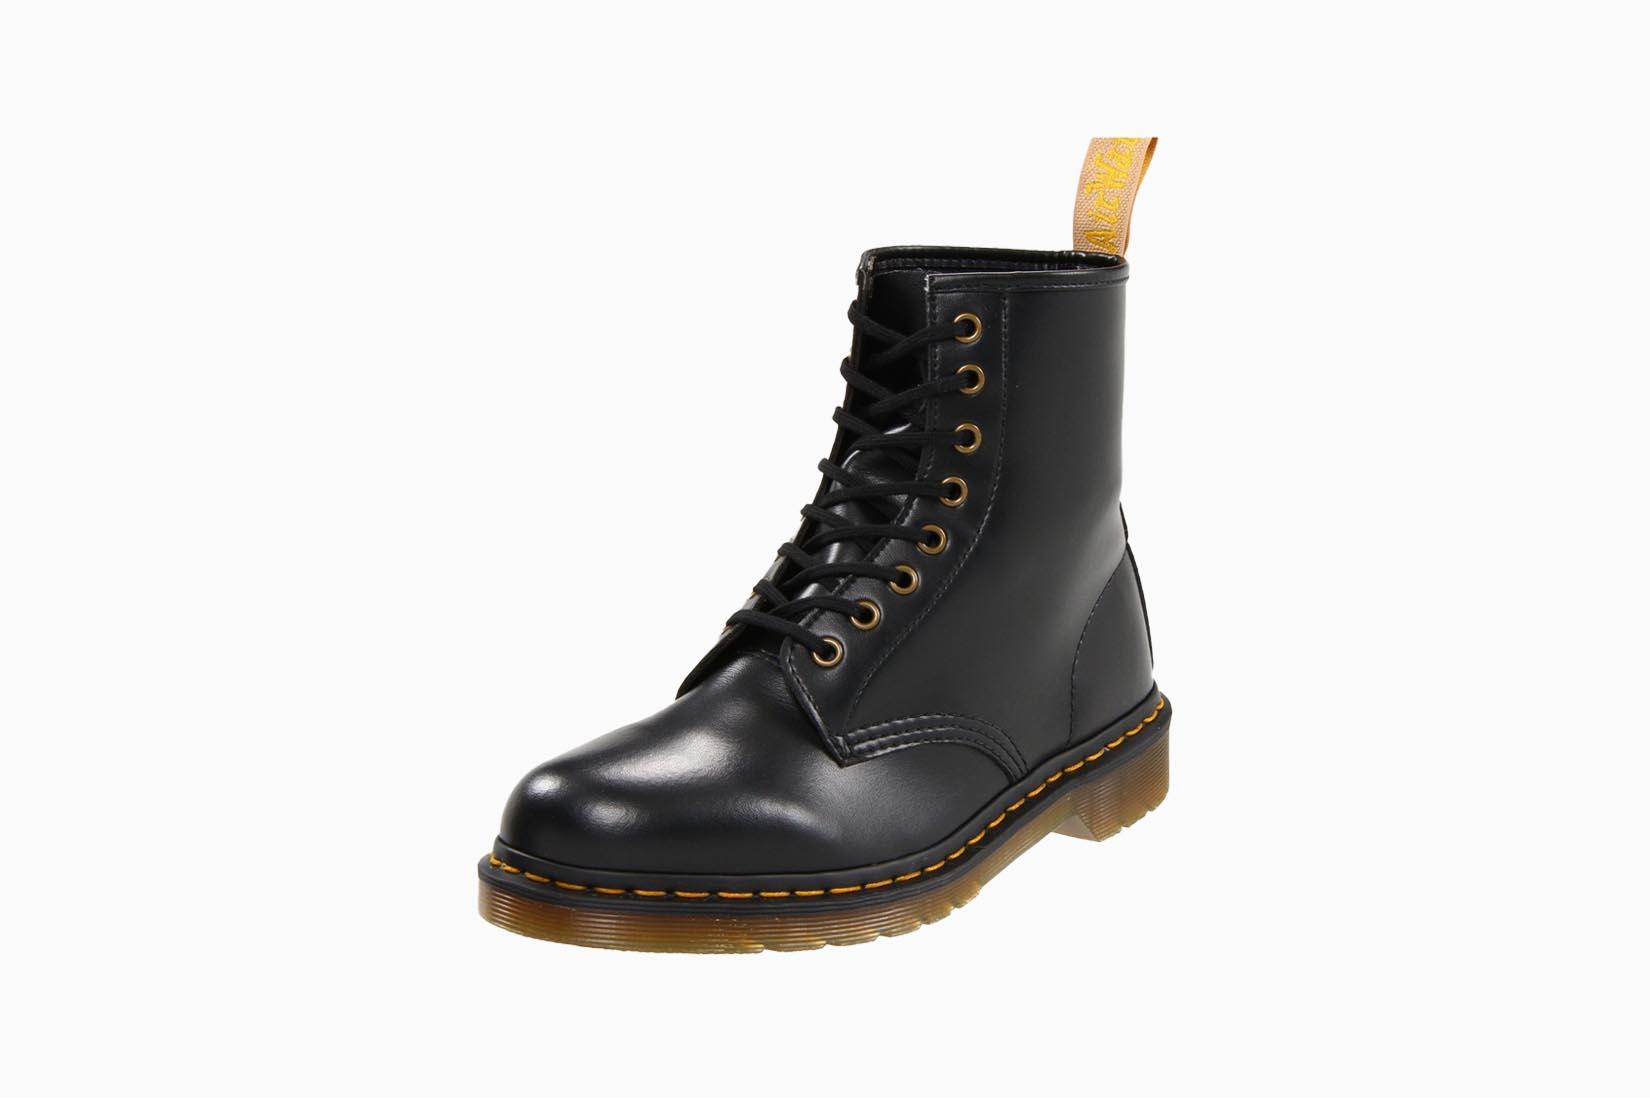 best boots men dr martens 1460 boots review Luxe Digital